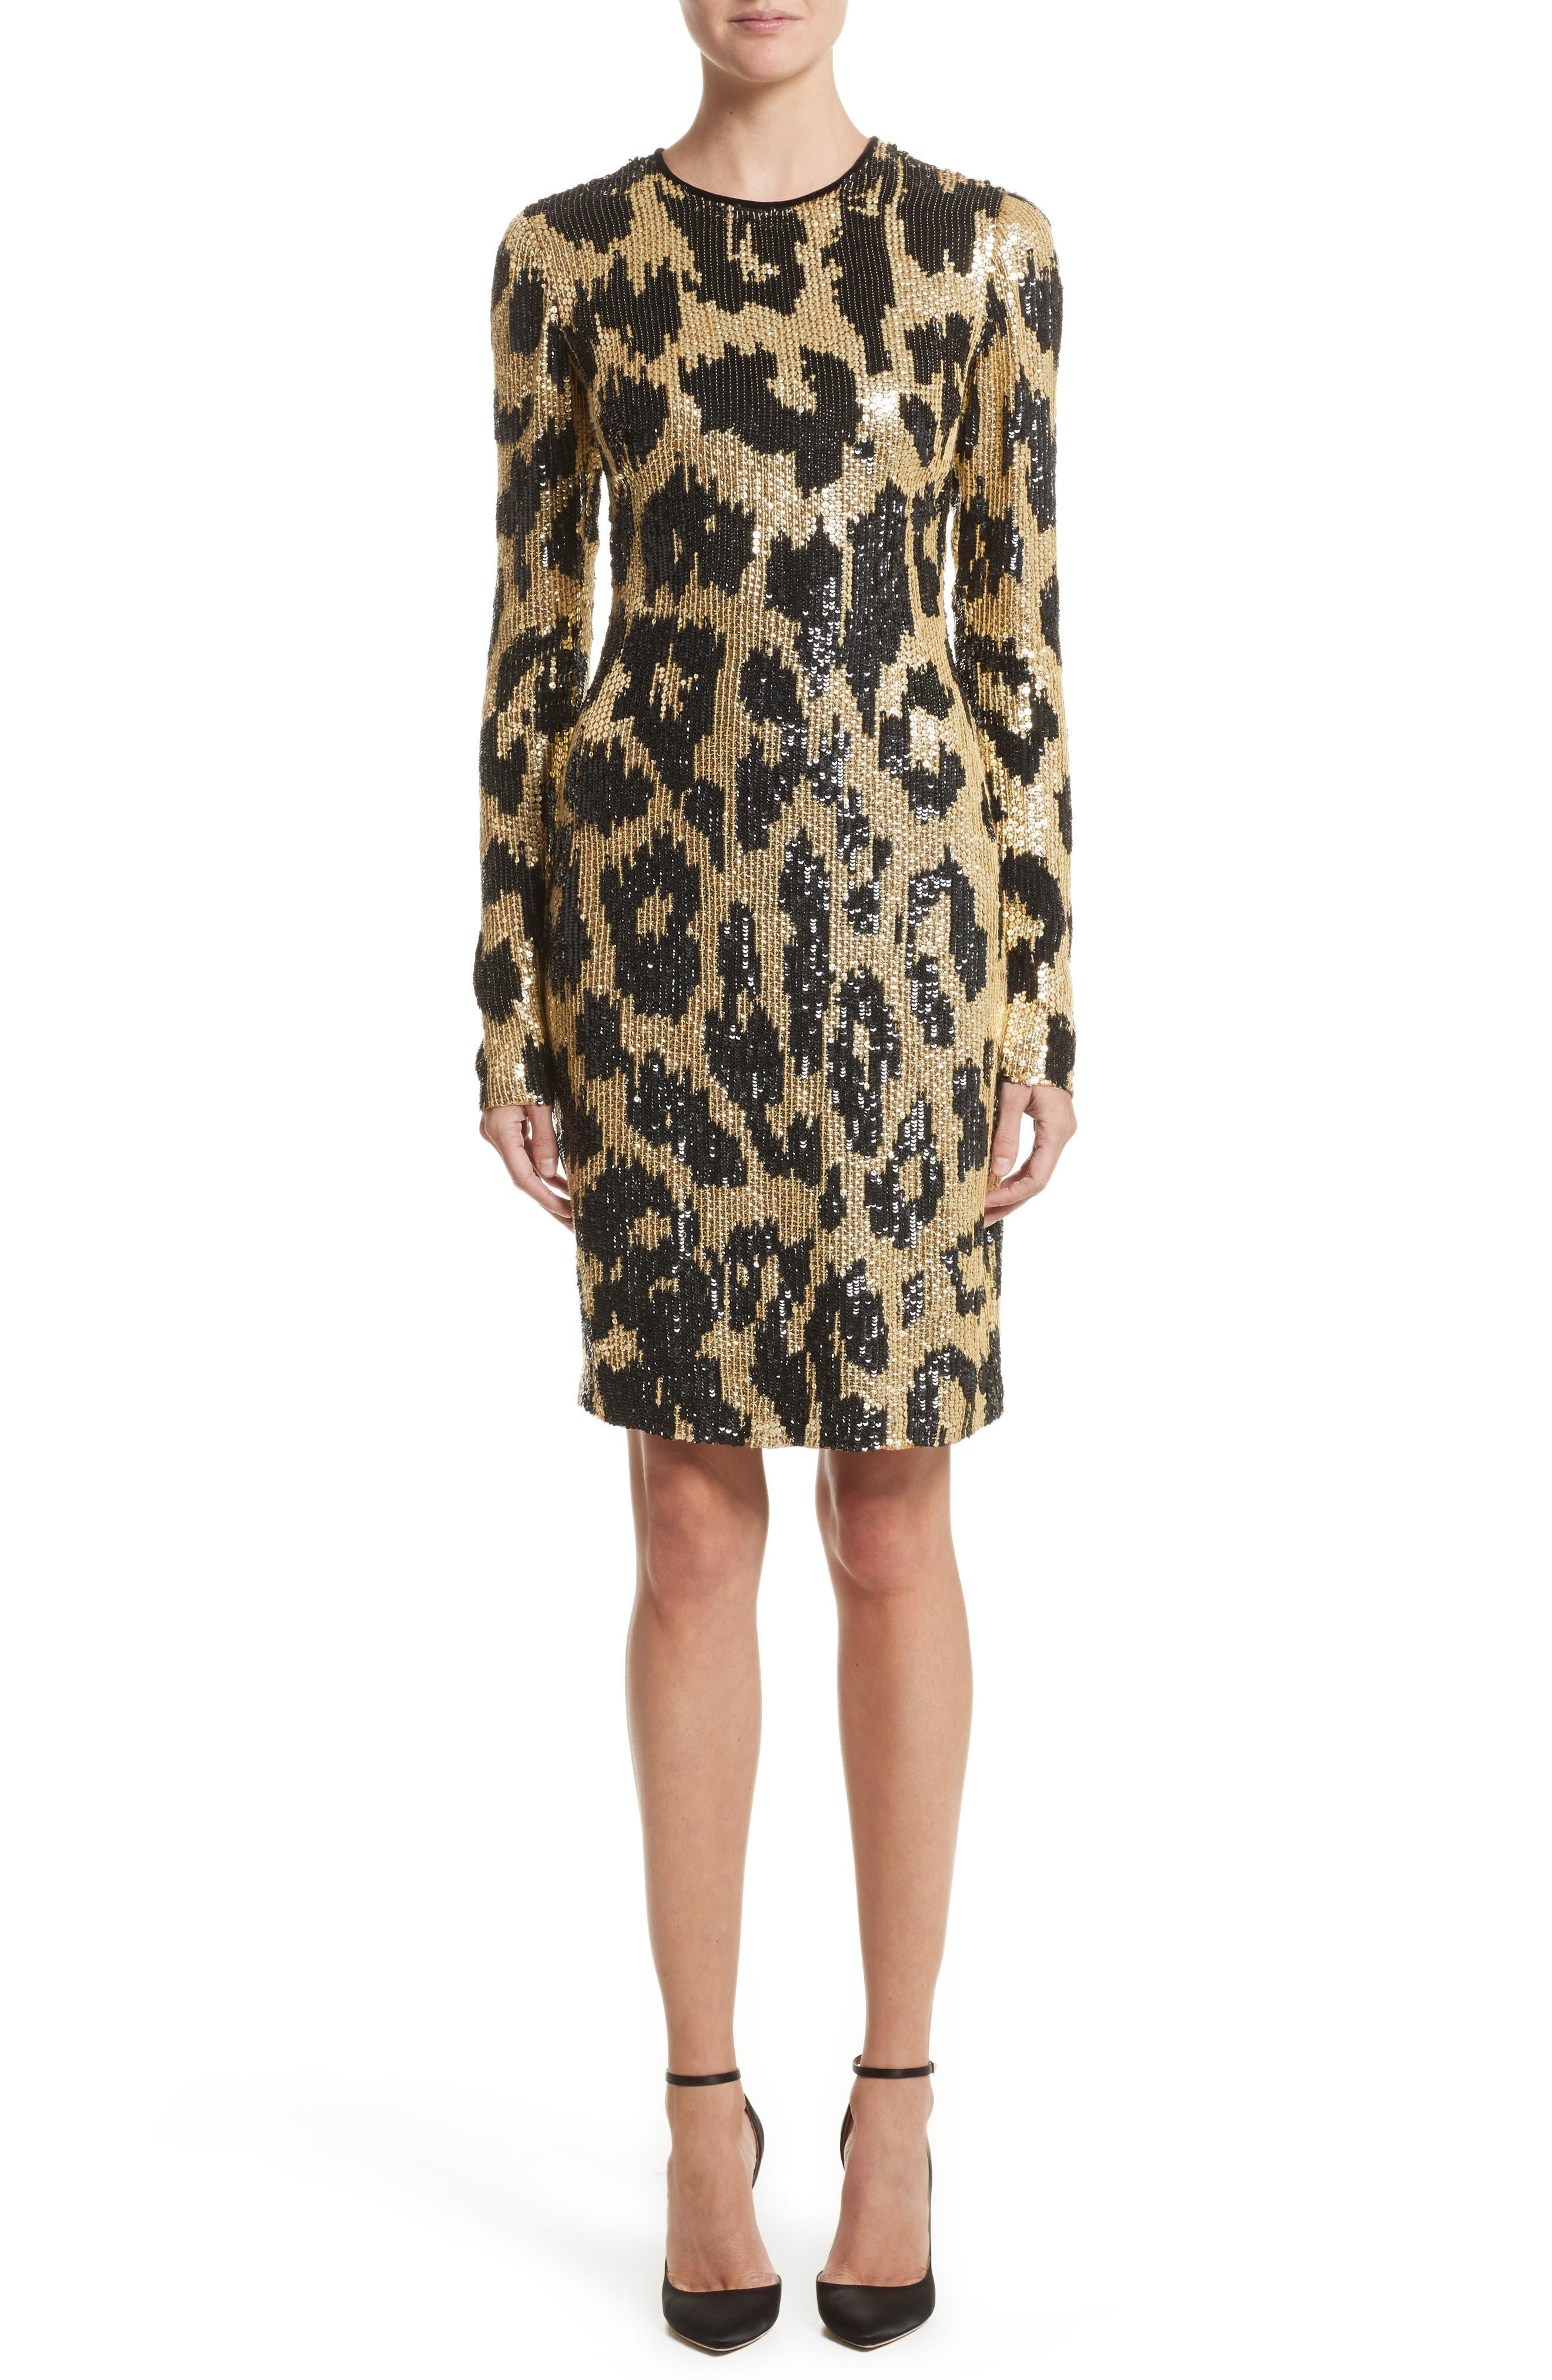 Cheetah Print Sequin Sheath Dress,                         Main,                         color, Black/ Gold